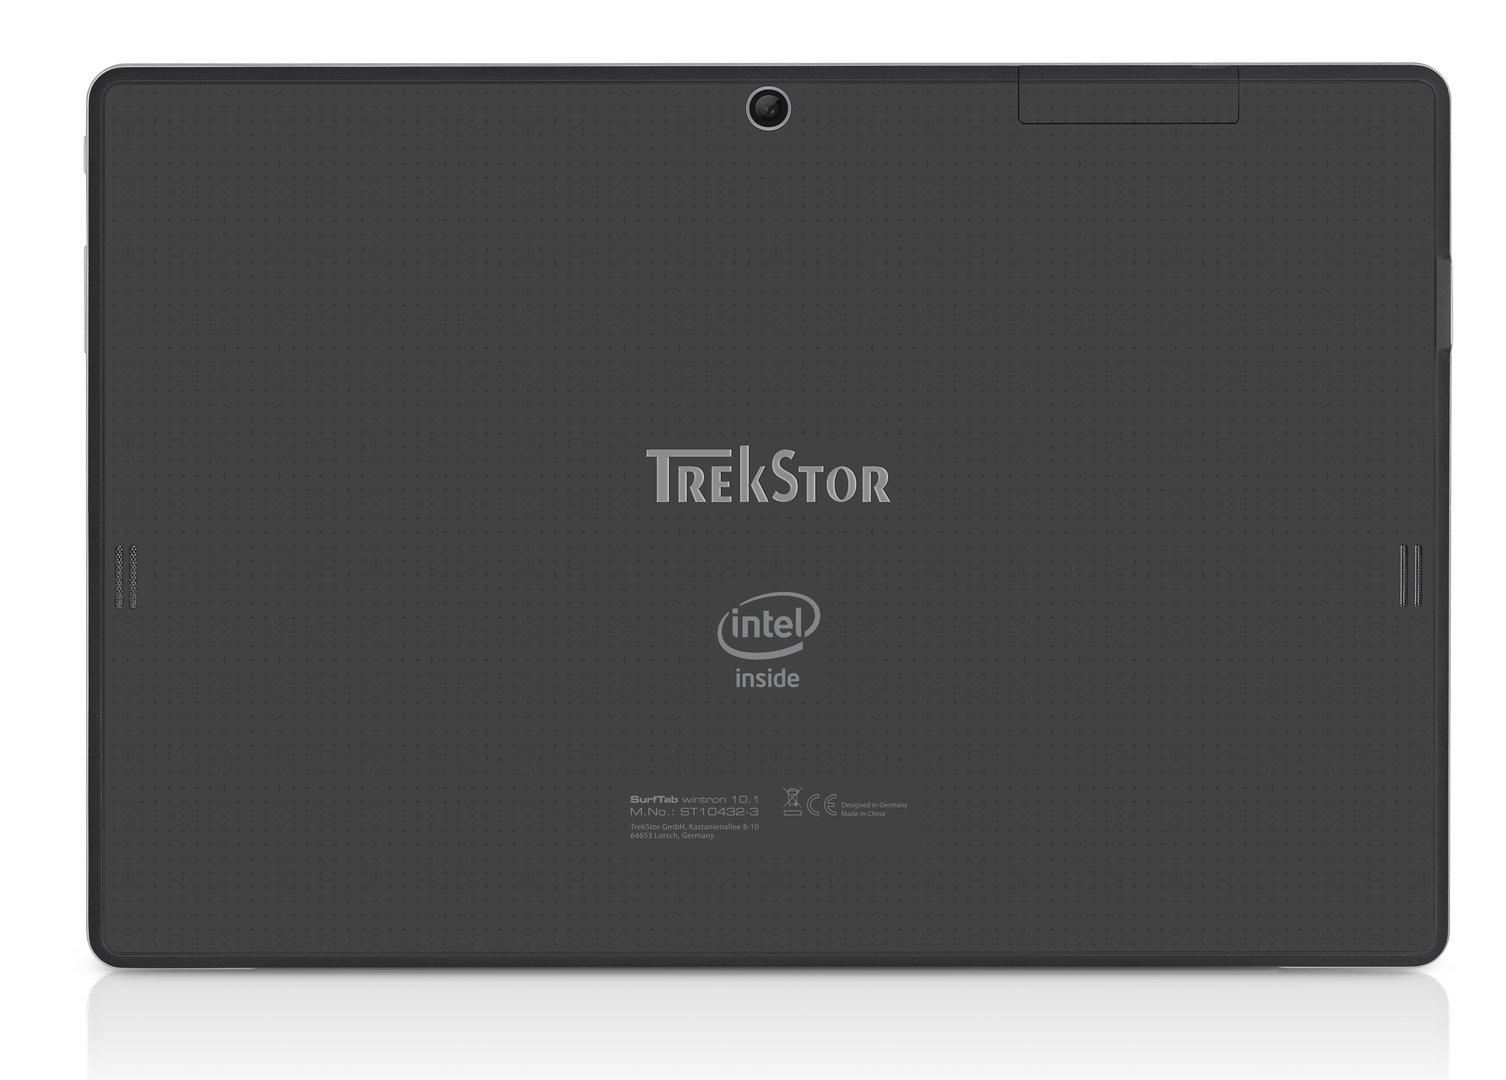 TrekStor SurfTab wintron 10.1